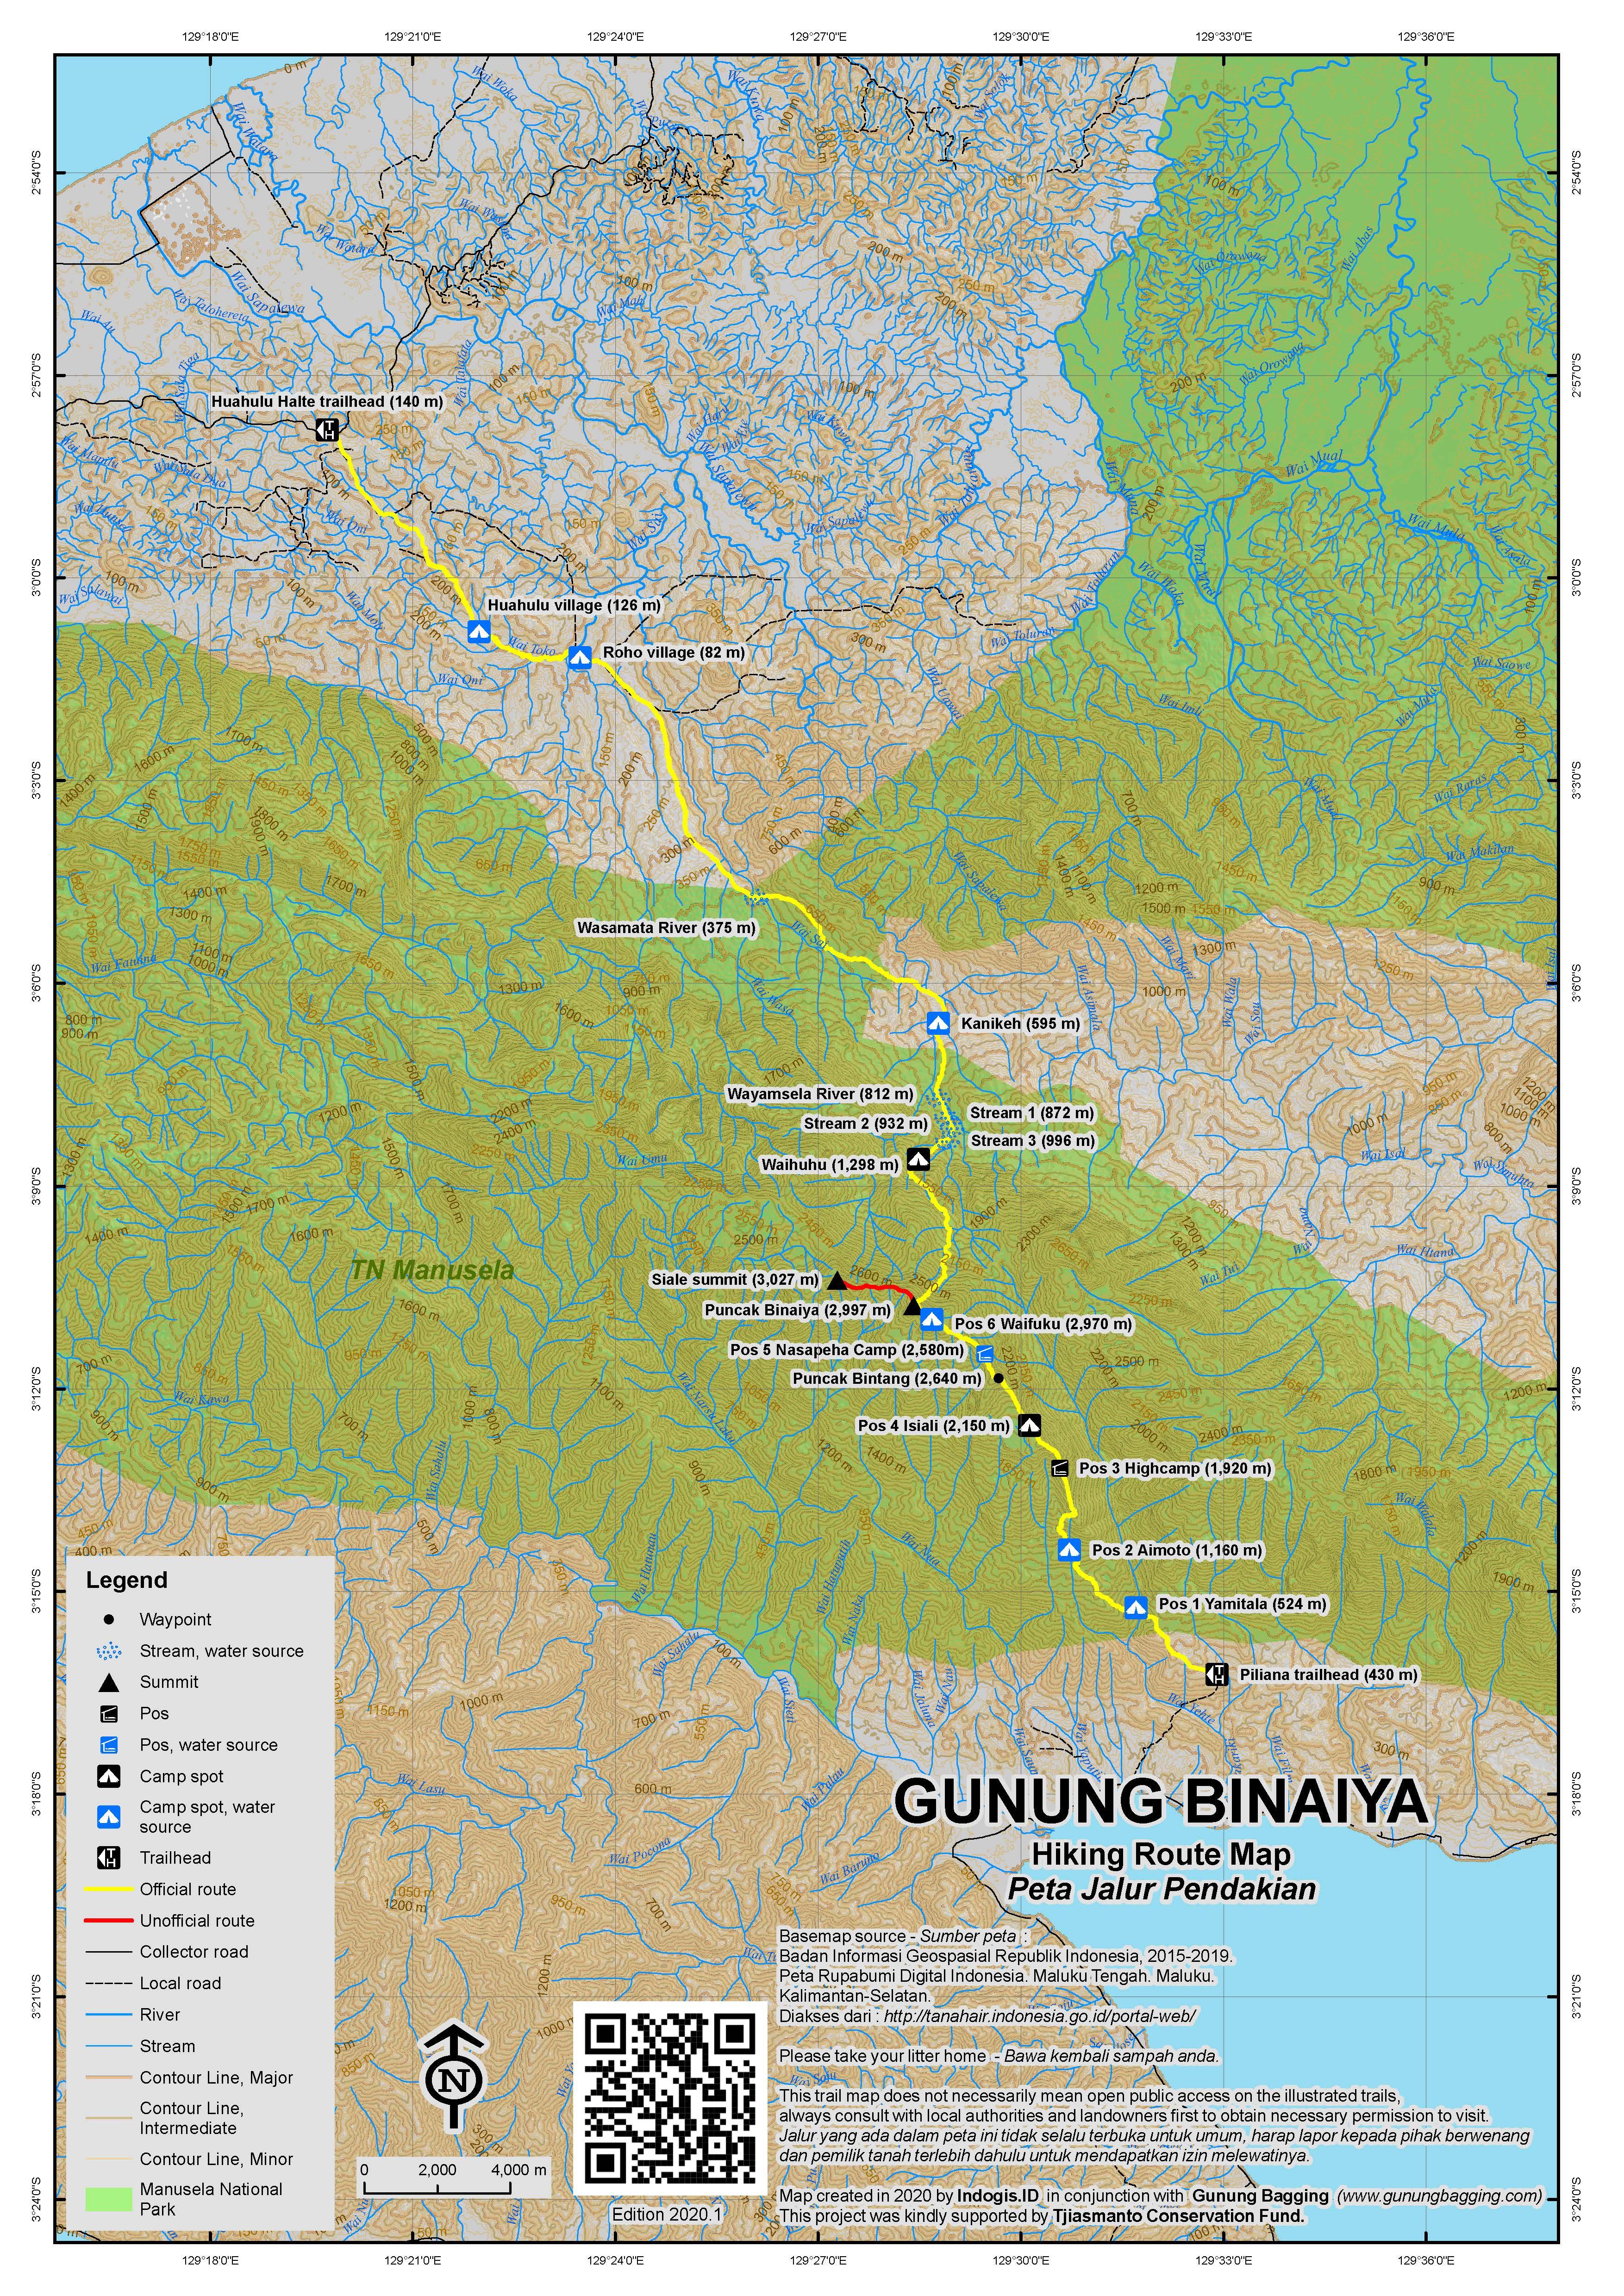 Peta Jalur Pendakian Gunung Binaiya